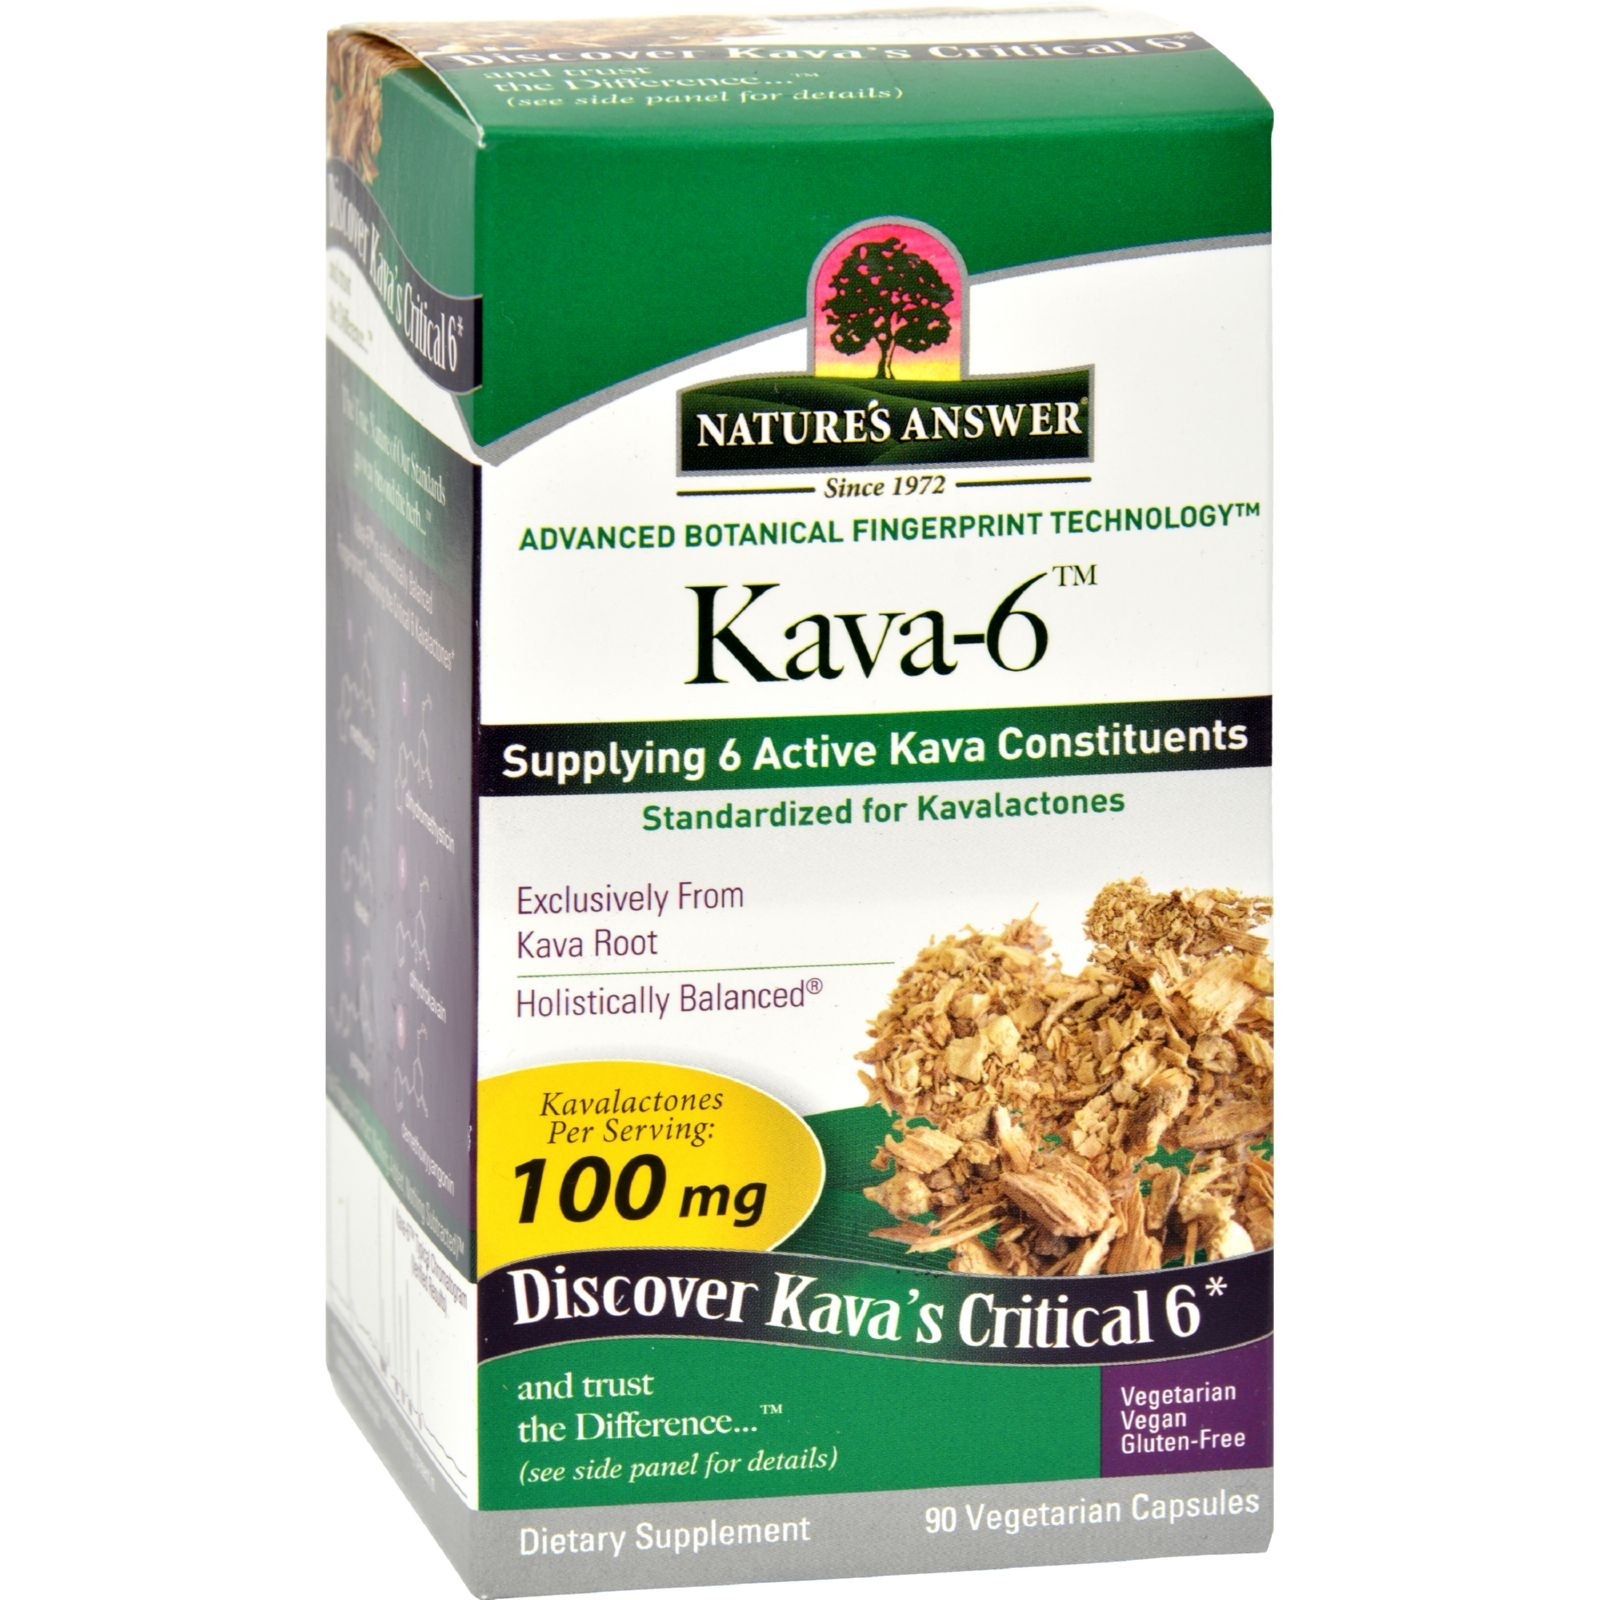 2Pack! Nature's Answer Kava 6 Capsules - Gluten Free - 90 Vegetarian Capsules